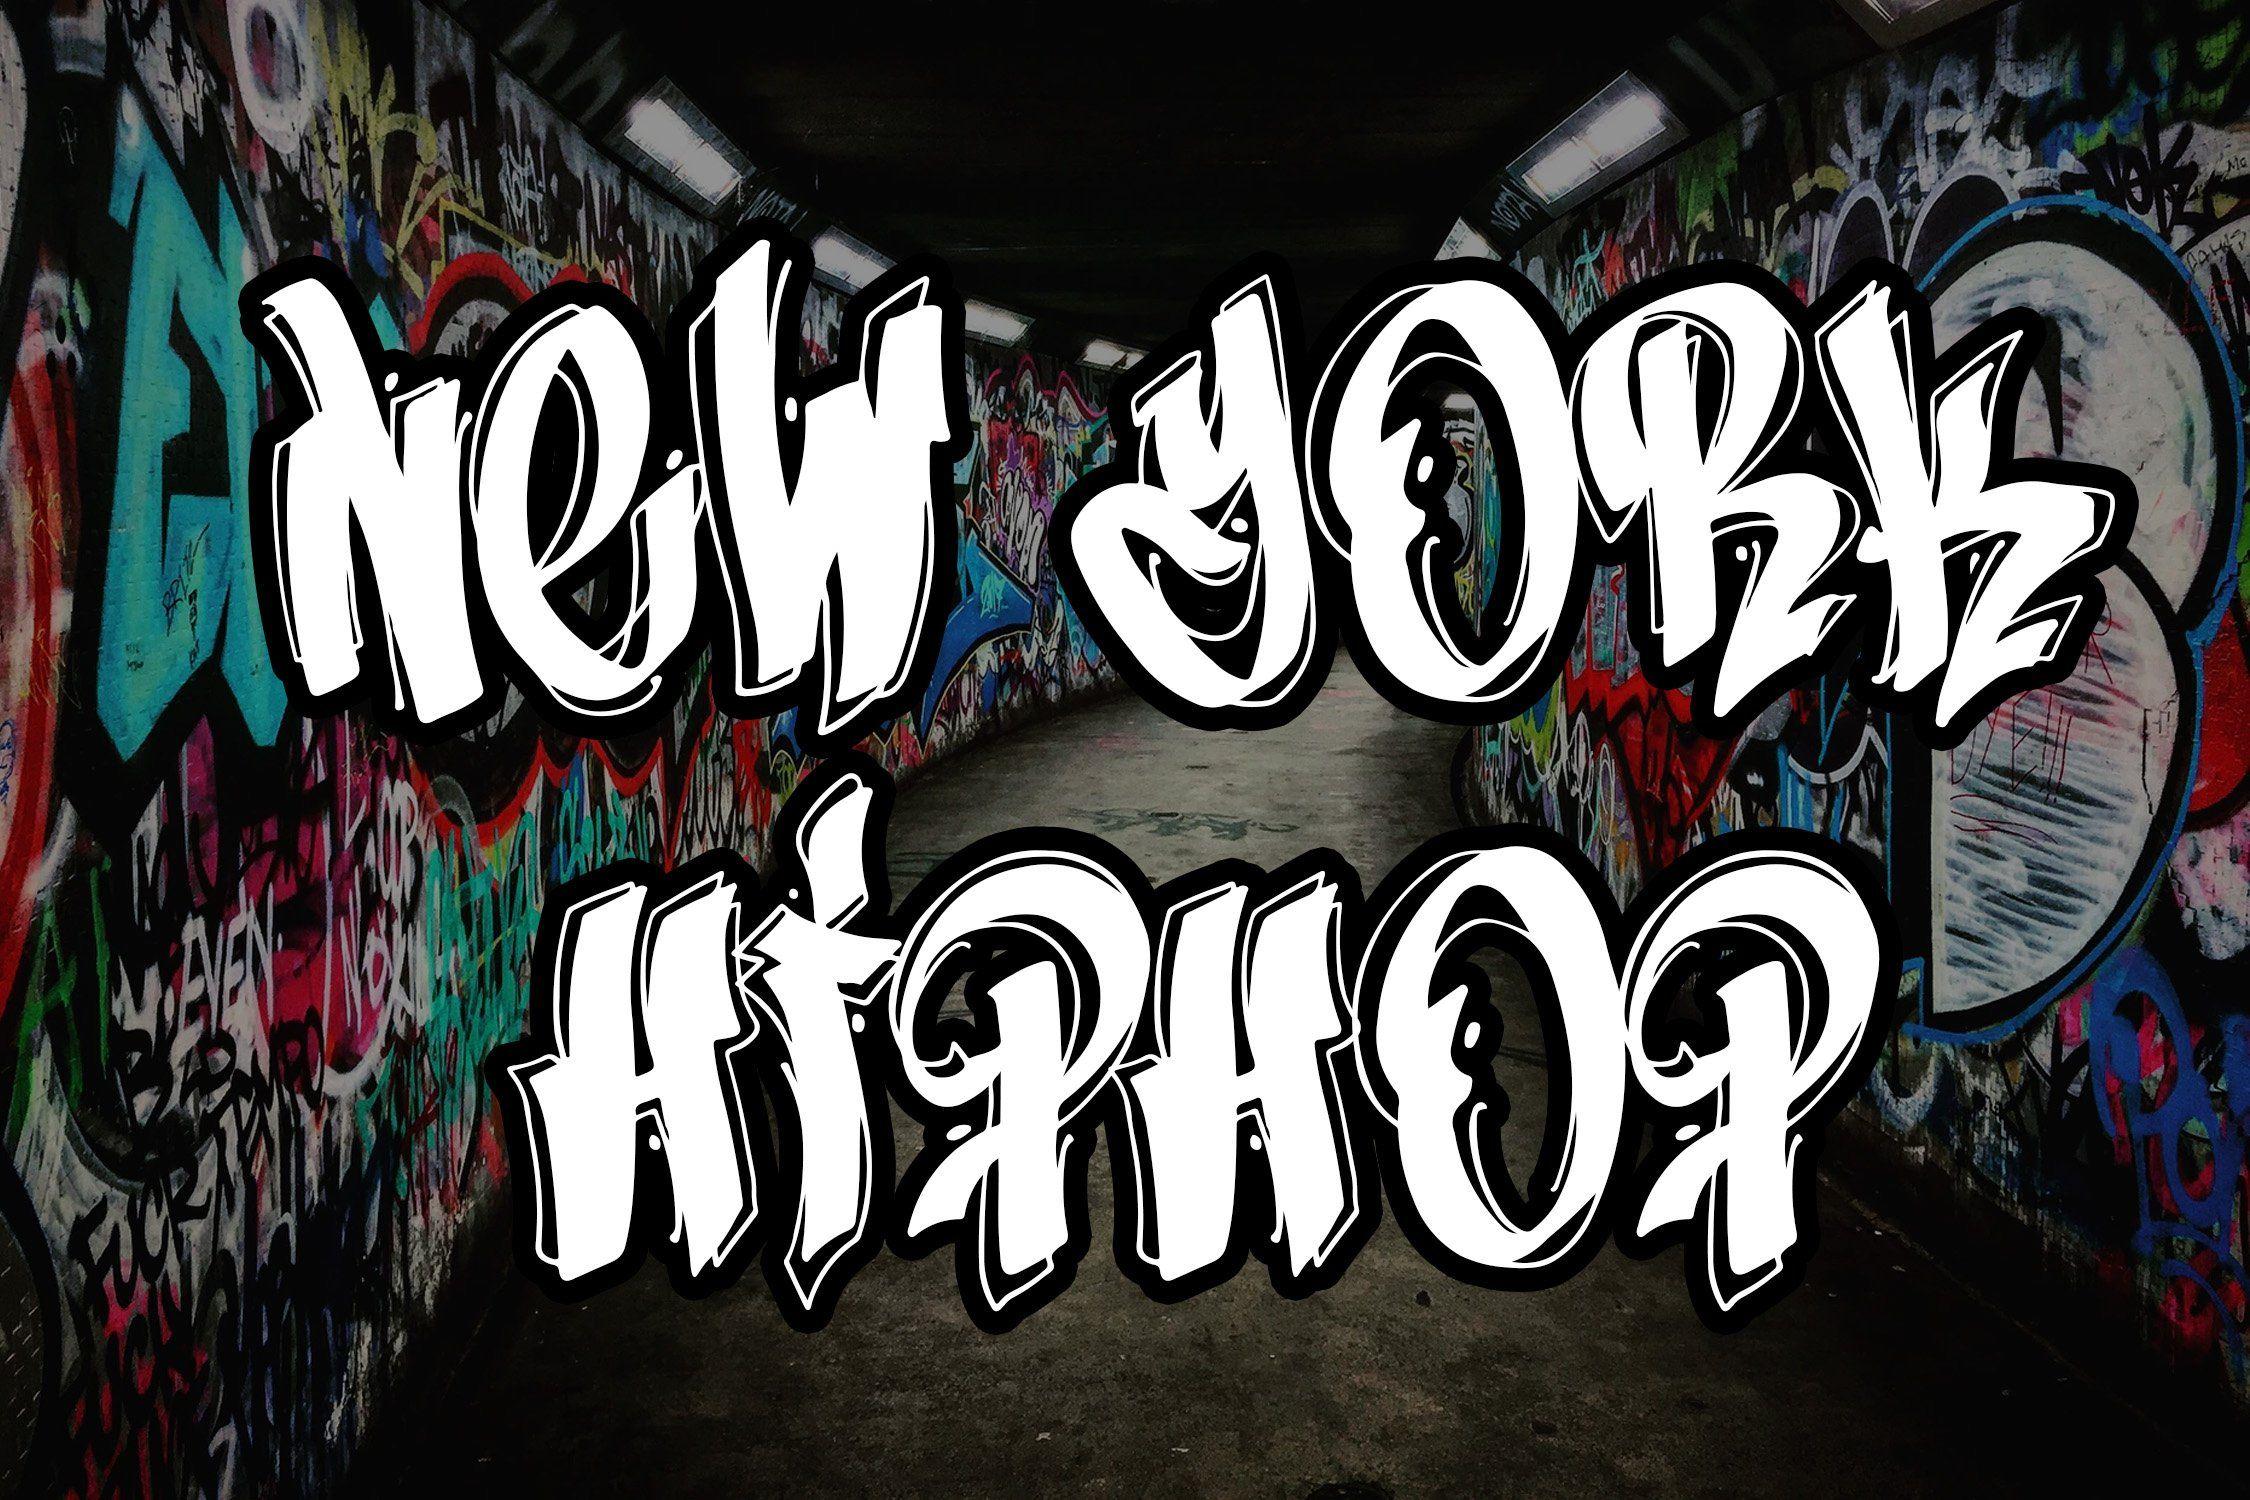 New York Hip Hop Graffiti Font Graffiti font, Easy